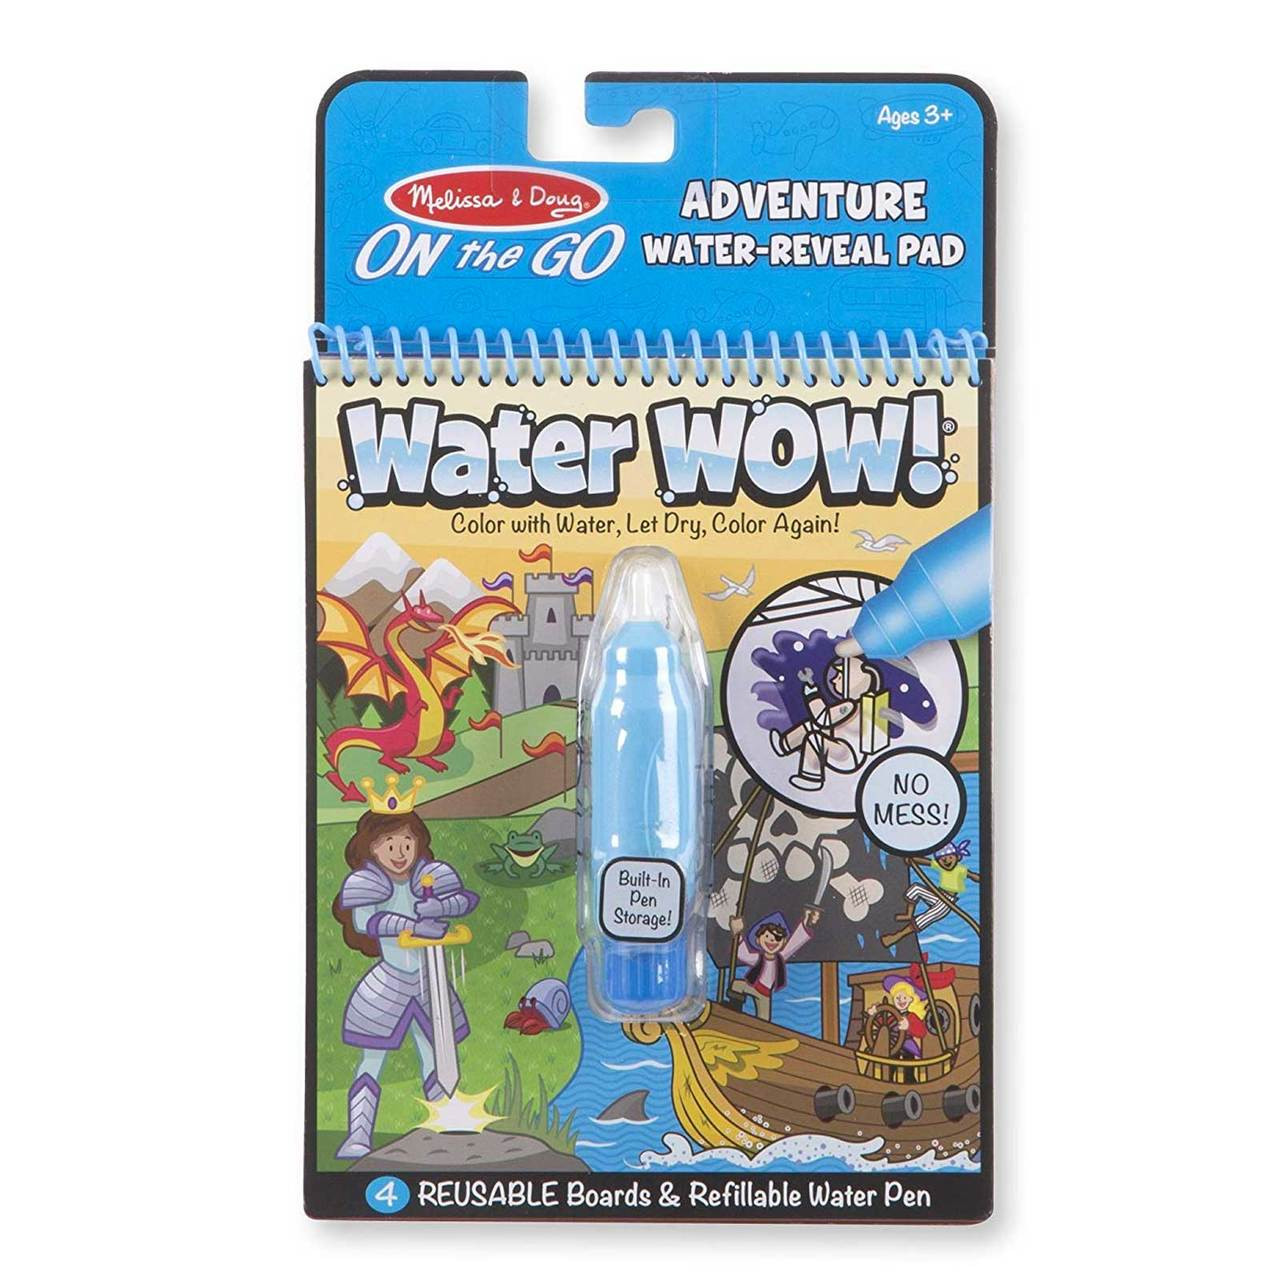 Water Wow! Water Reveal Pad - Adventure